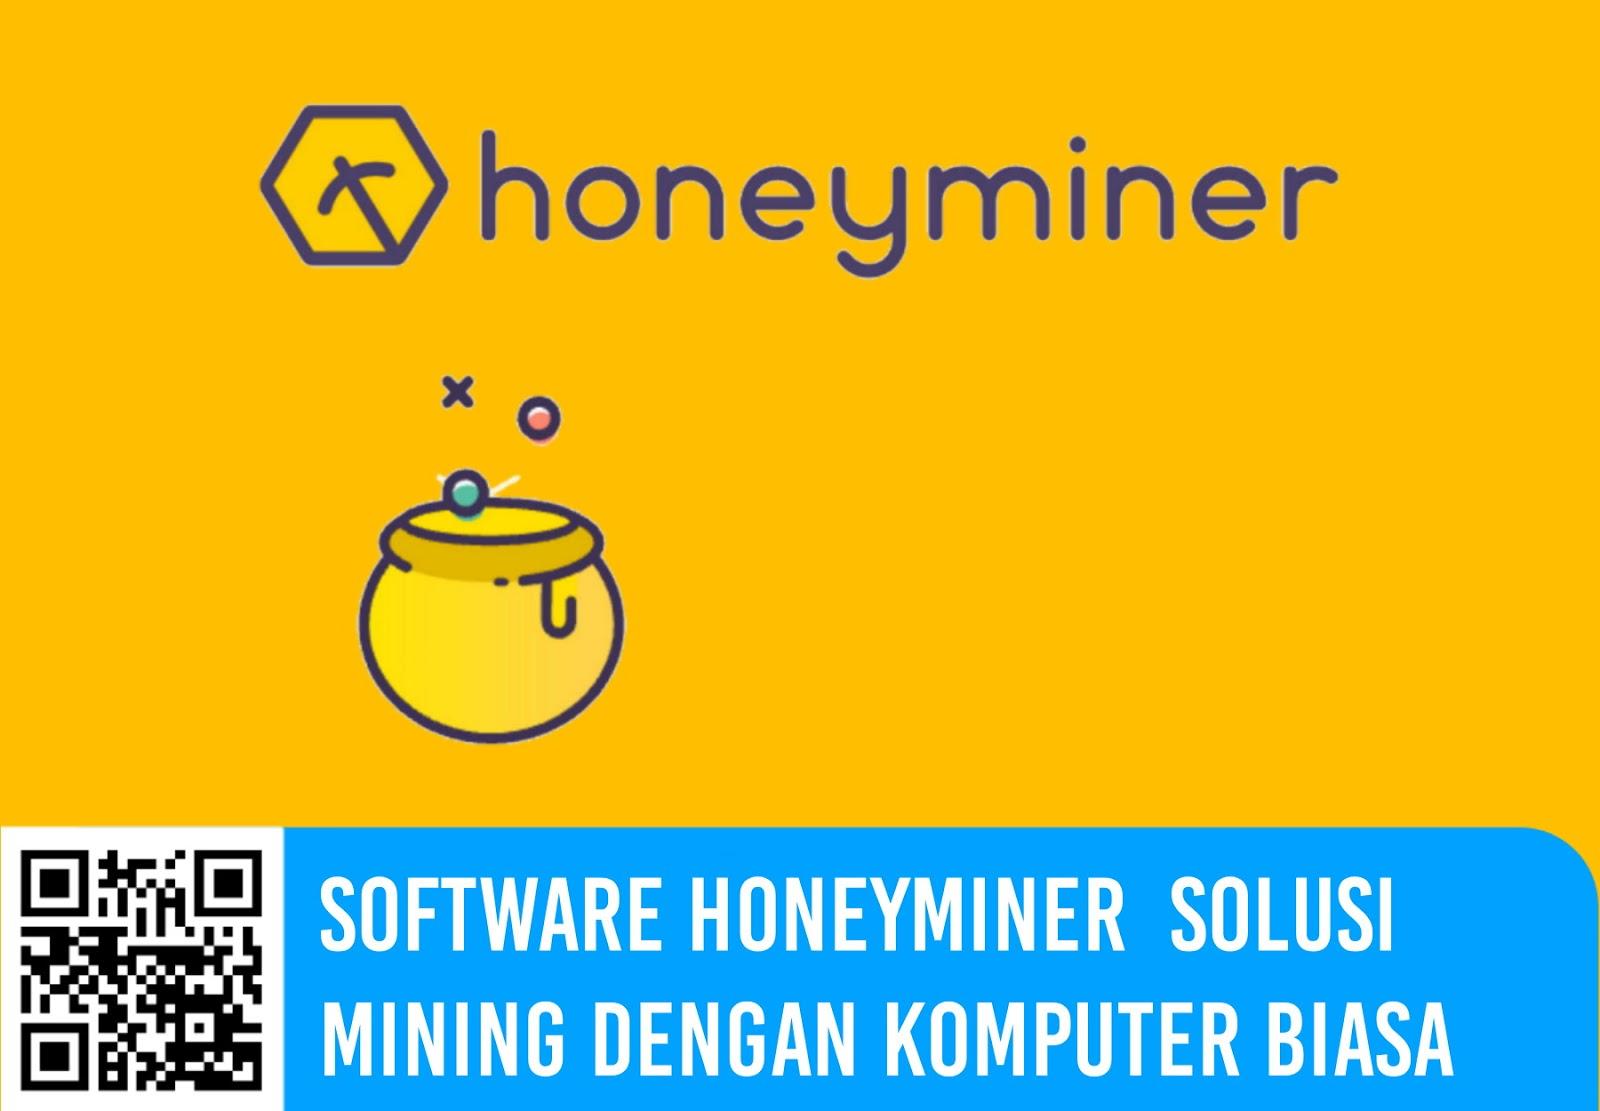 Software Honeyminer Solusi Mining Dengan  Komputer Biasa